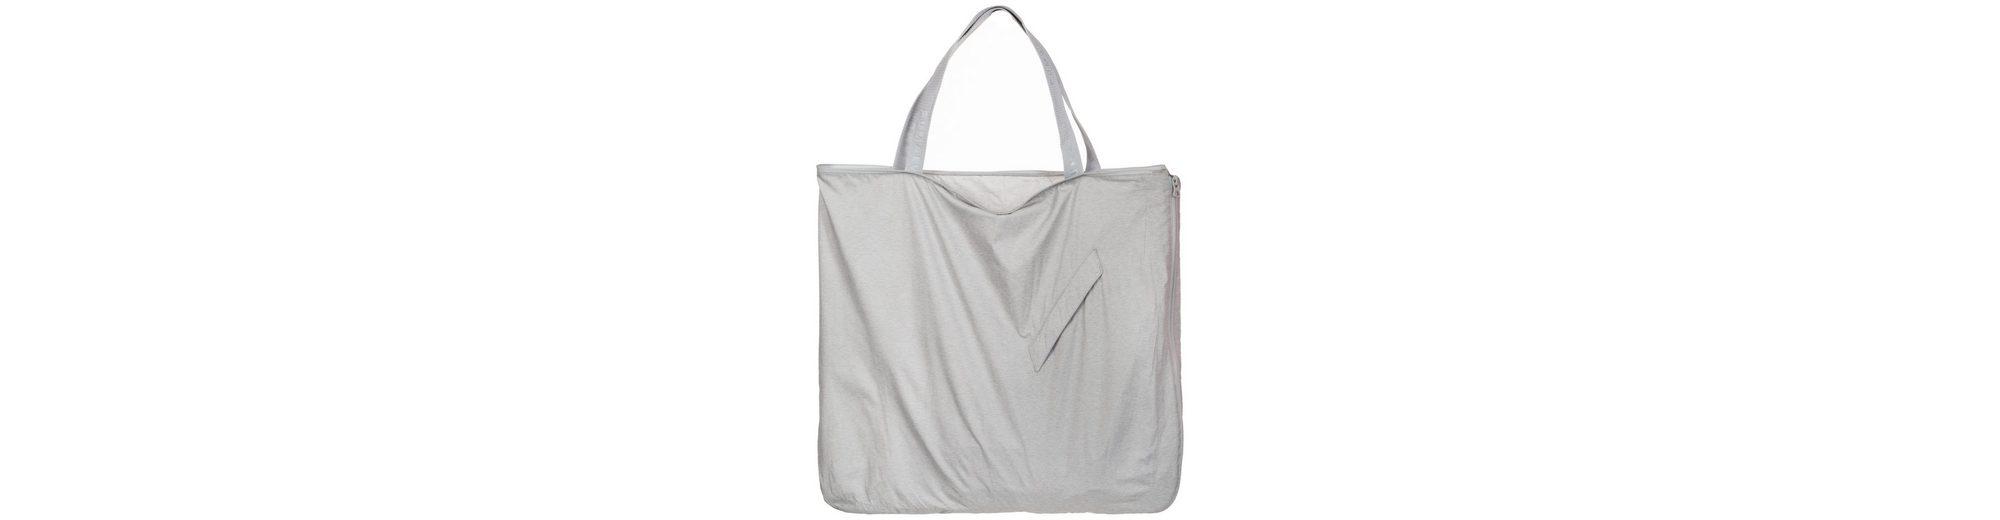 PUMA Evo Jack Bag Mantel Damen Günstig Kaufen Offizielle Seite yg8AtWPAe